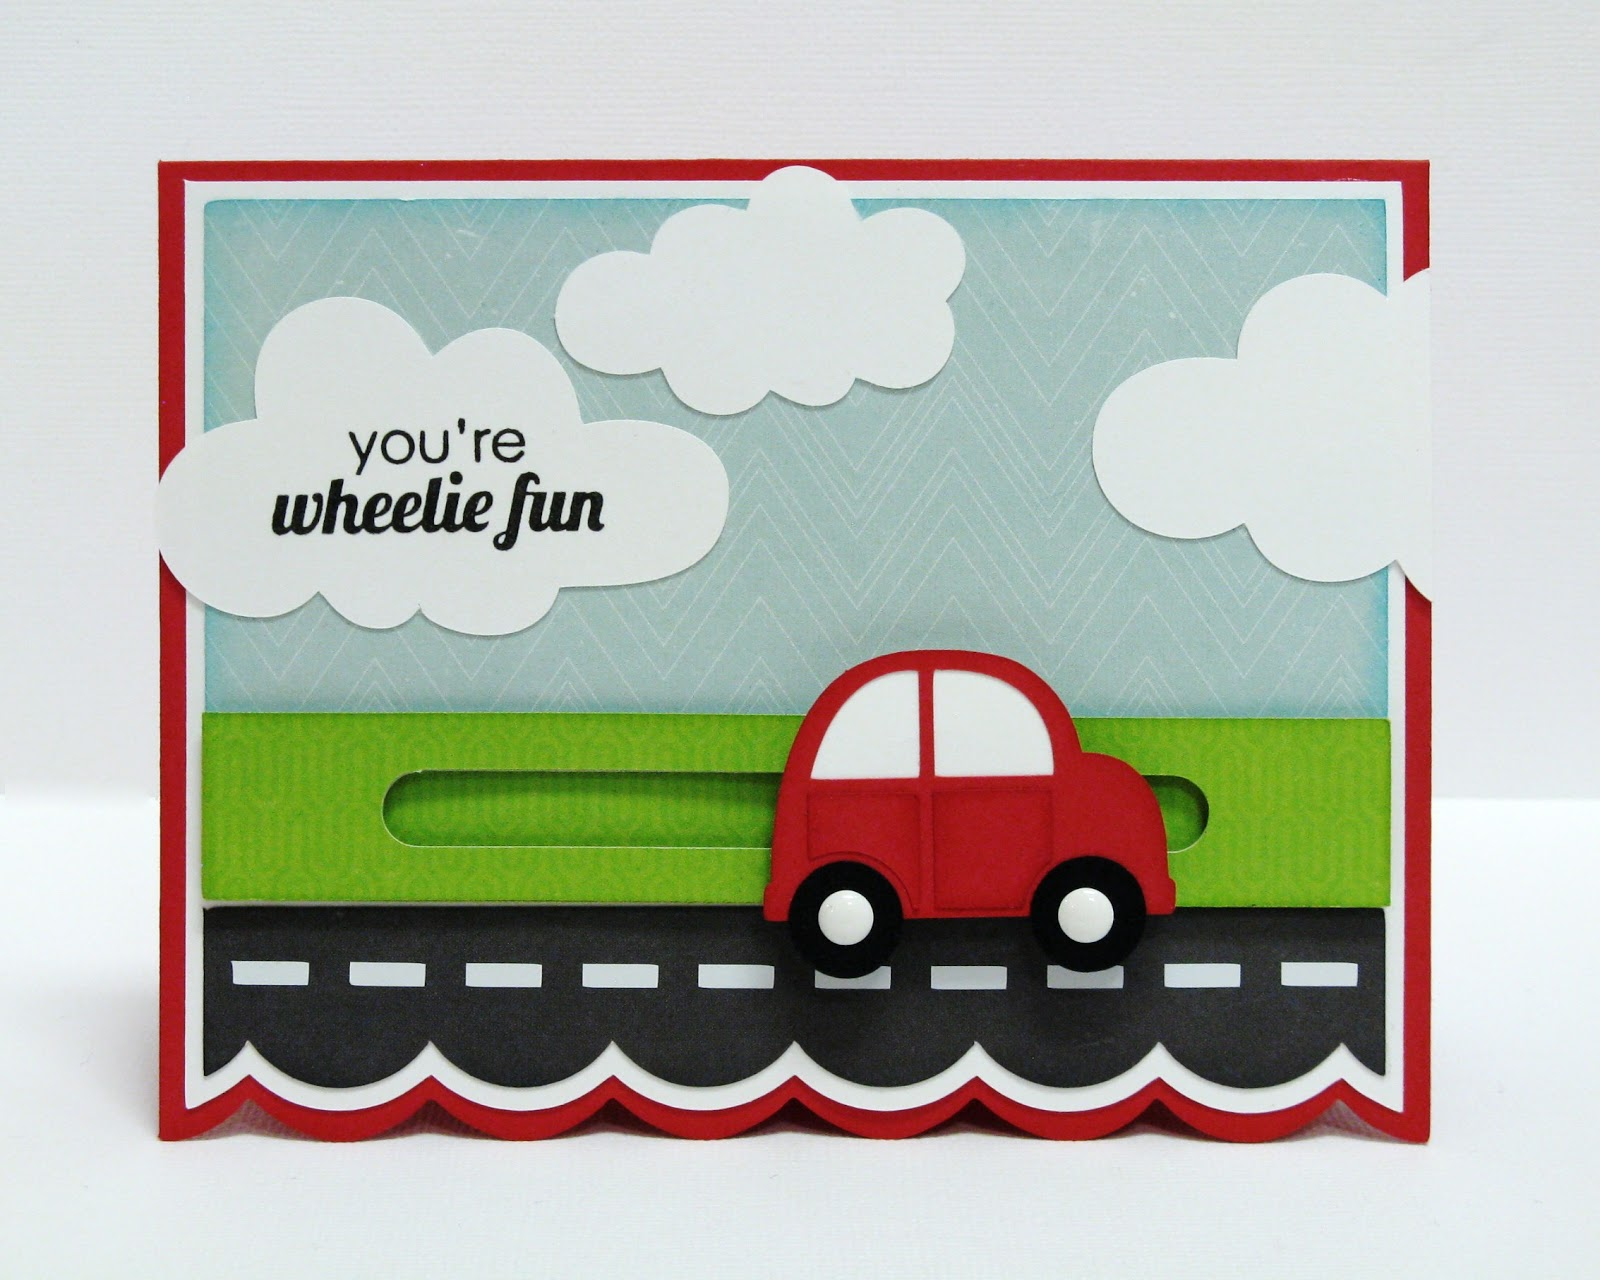 Echo Park We Are Family & Lori Whitlock Penny Slider Pinwheel Car Card by Mendi Yoshikawa